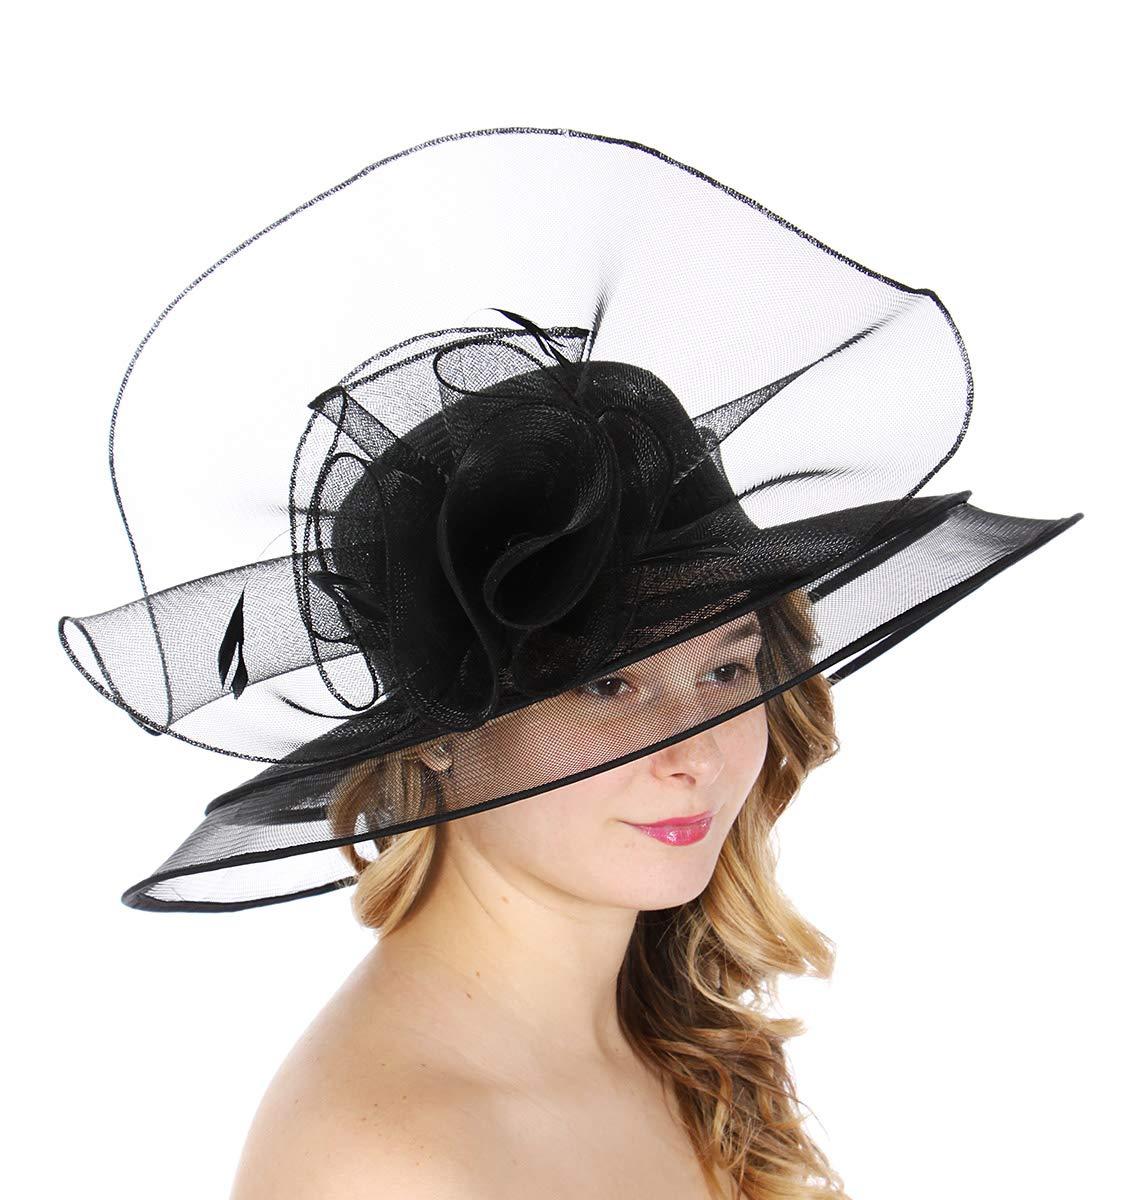 Dress Derby hat Women, for Church Party Kentucky Bridal Wedding Cocktail, Wide Brim Flower Cloche Bucket, Black 13